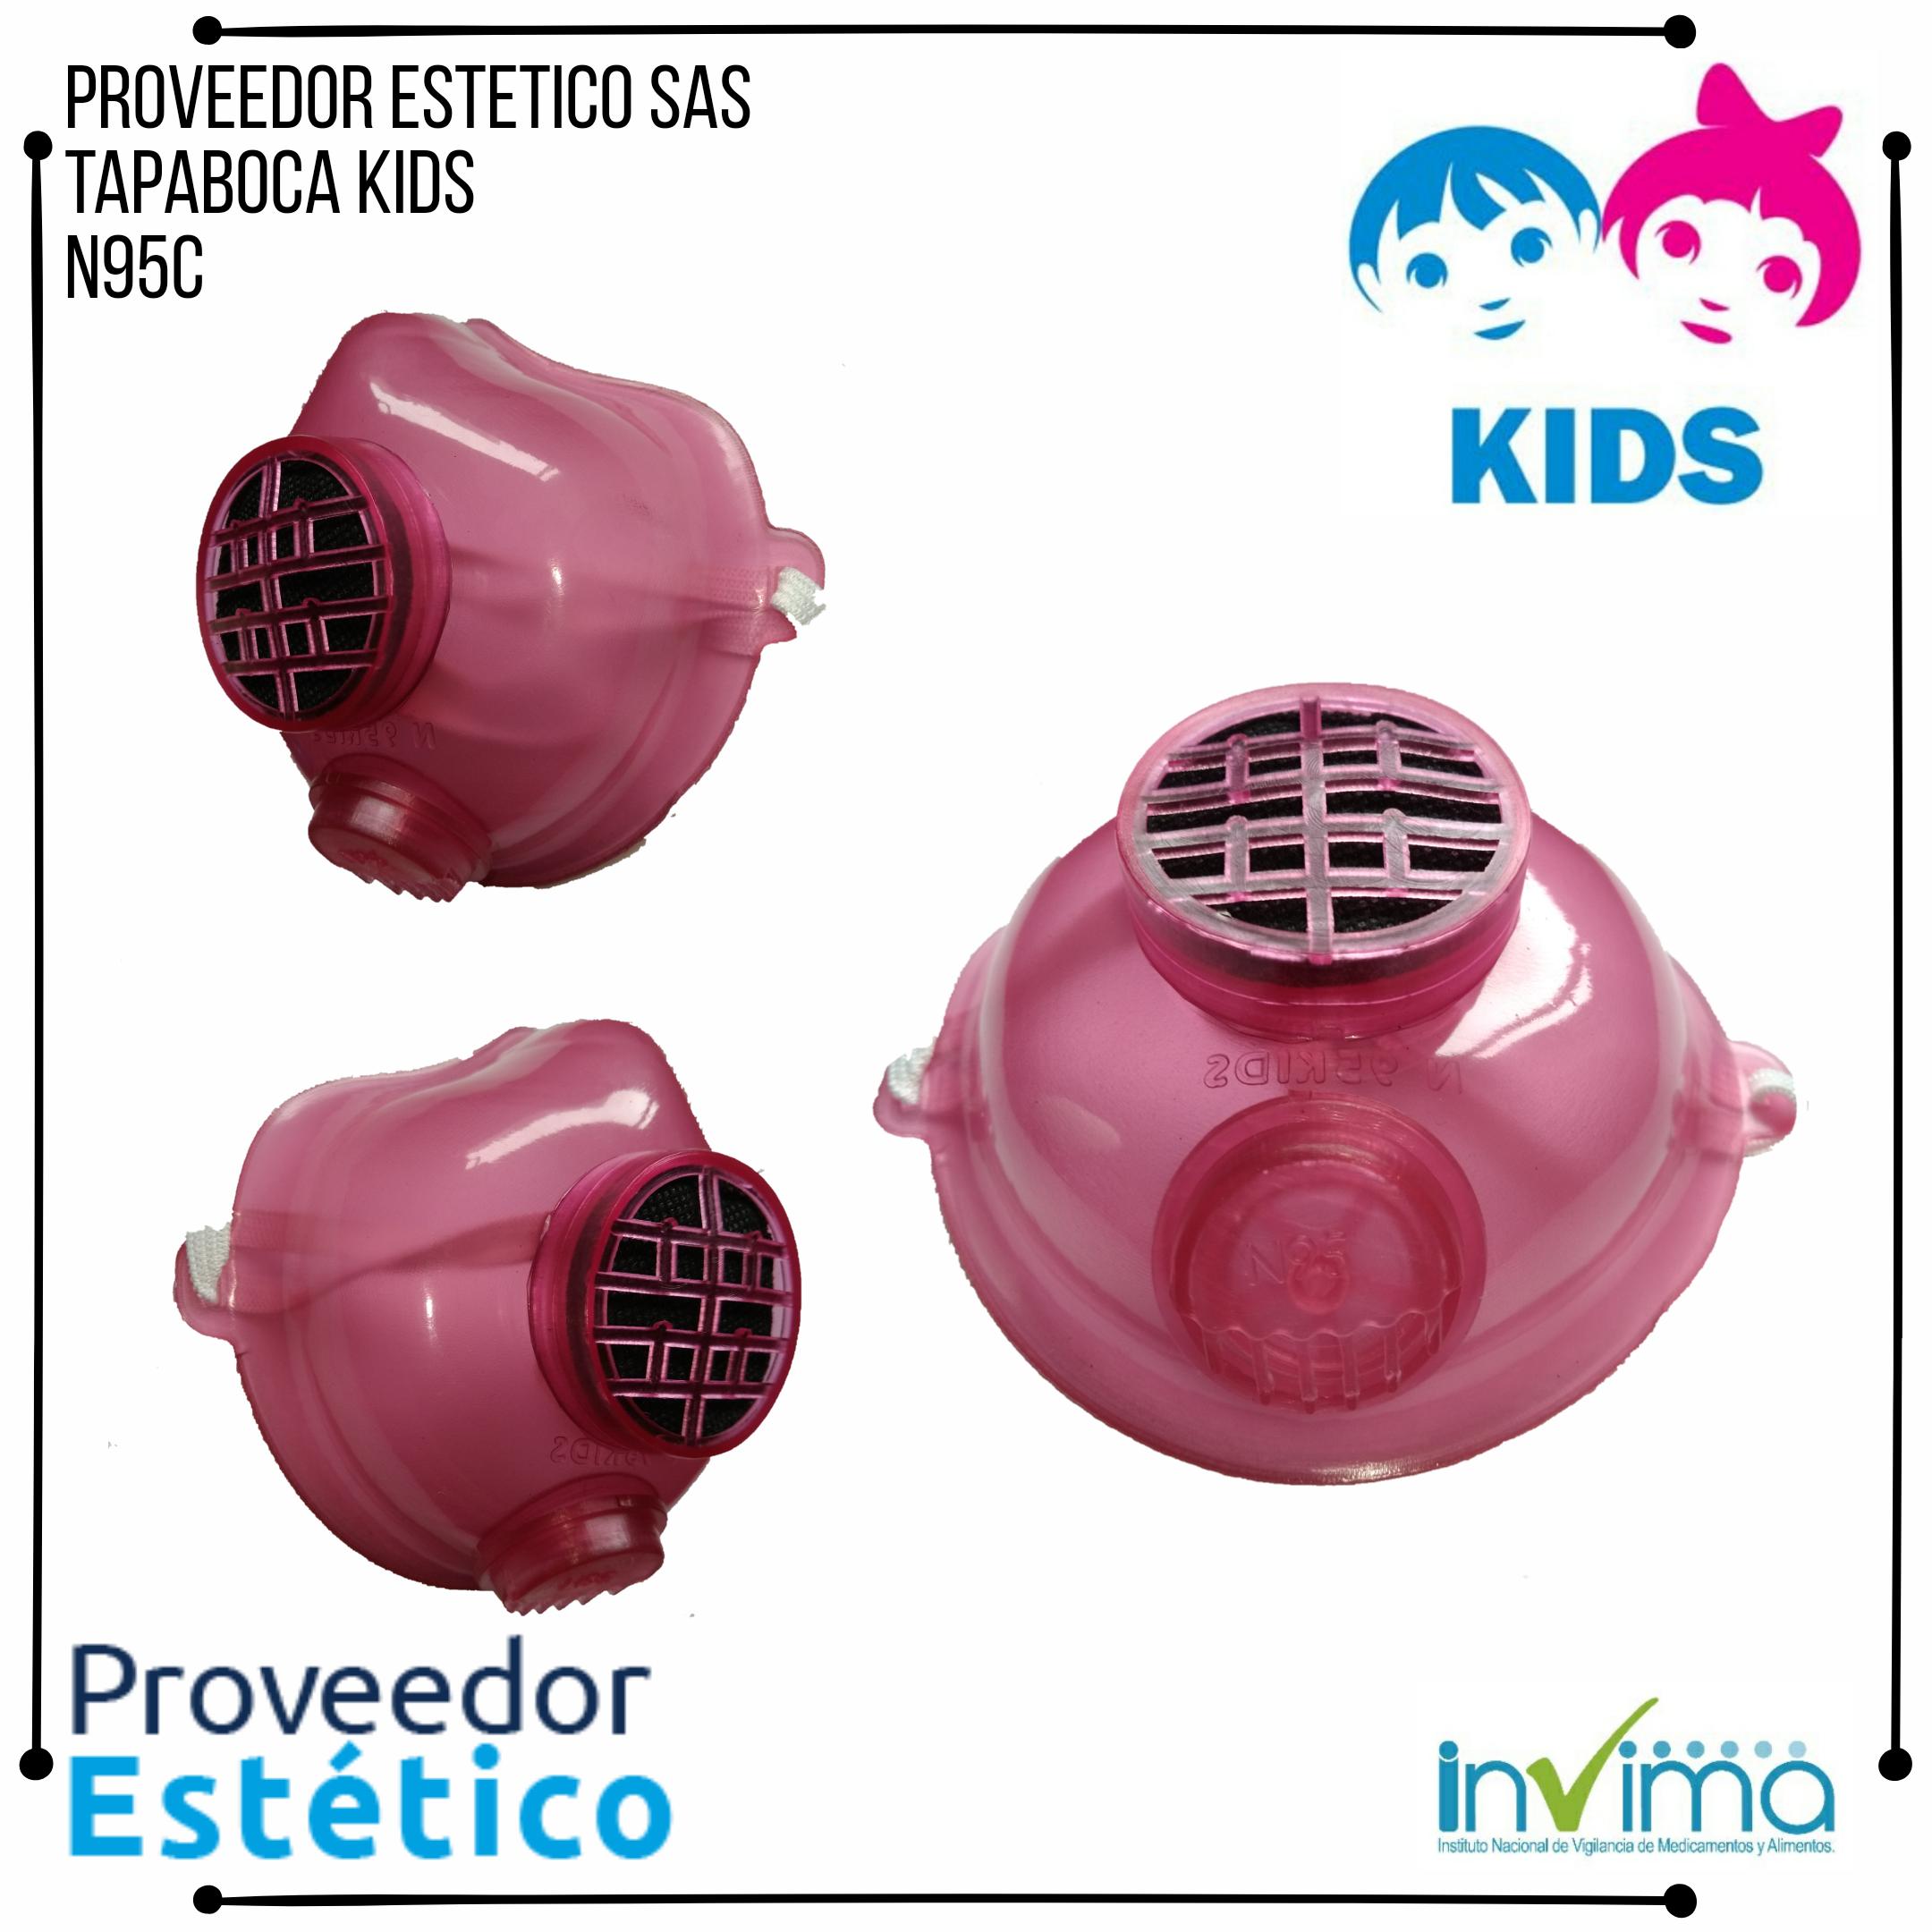 https://0201.nccdn.net/4_2/000/000/000/3fa/Tapaboca-N95-Kids.png